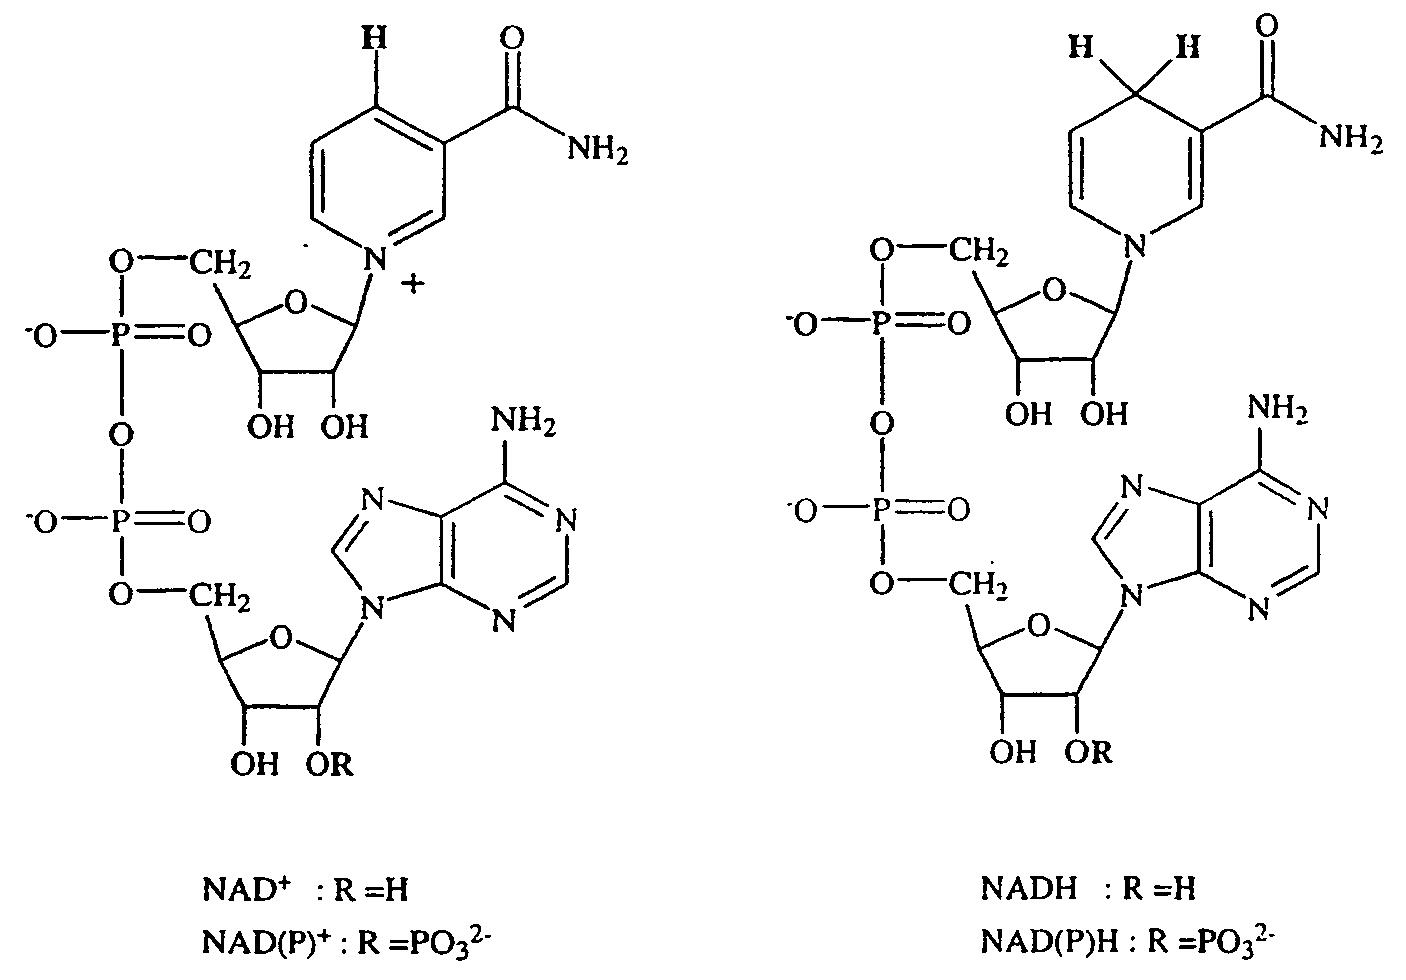 Nadh Nadph Oxidoreductases Oxidoreductases Nadh Nadph